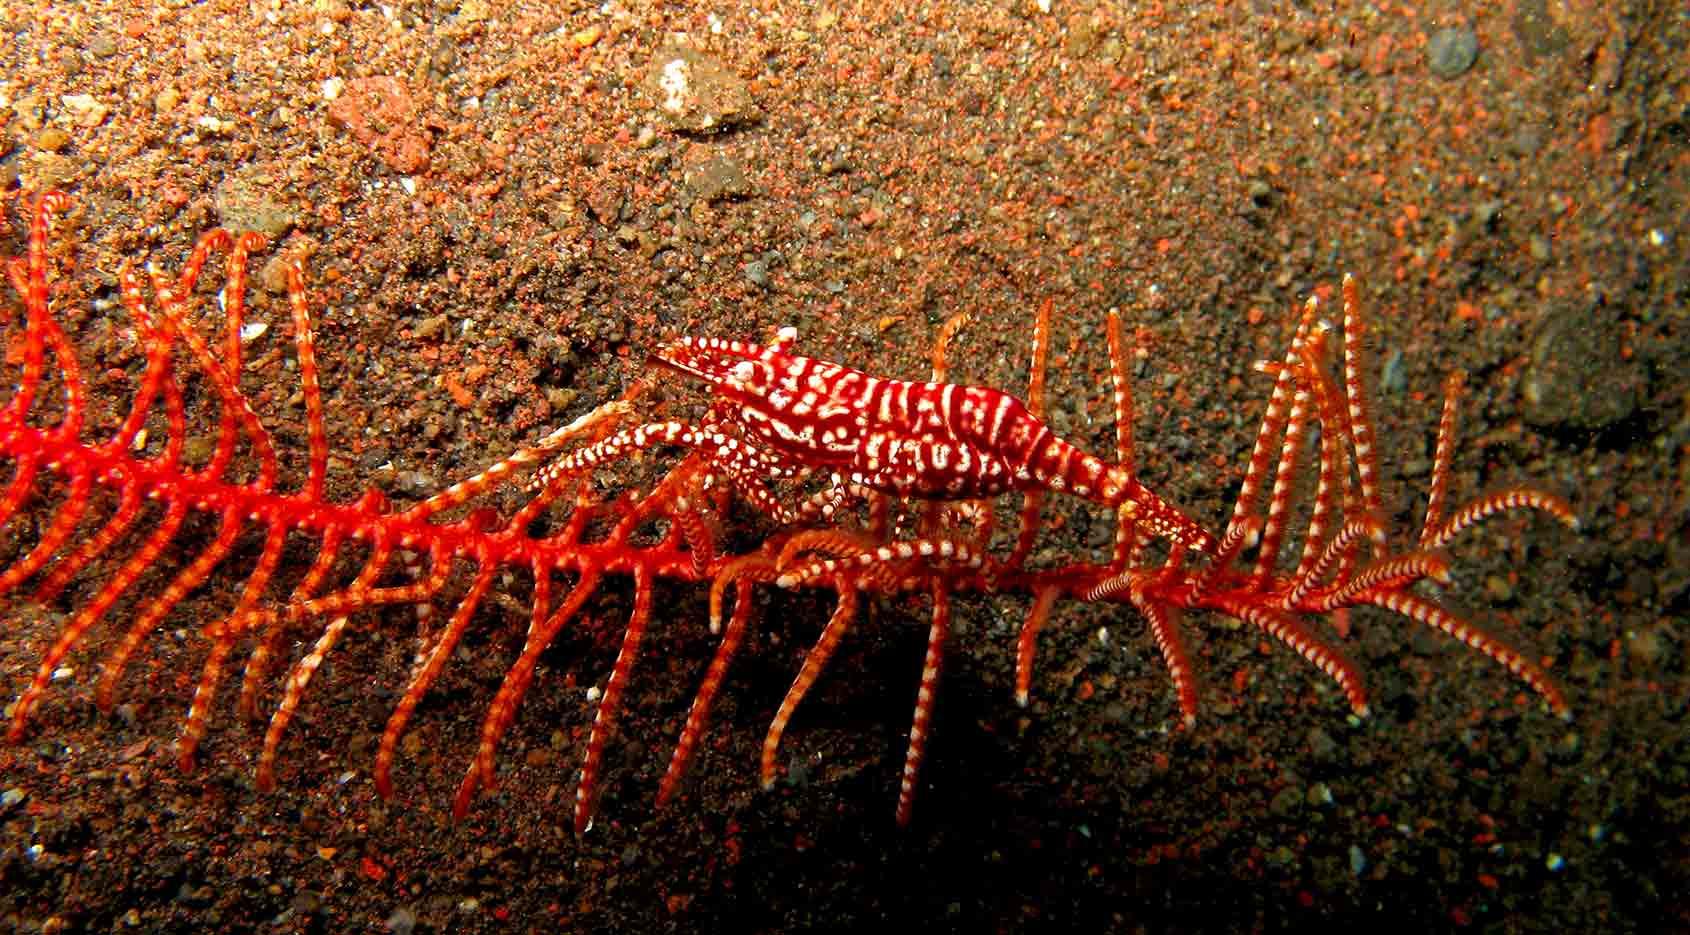 Gili-Trawangan-Lombok-Activities-Activity-Scuba-Scubadive-Scubadiving-Dive-Diving-53.jpg